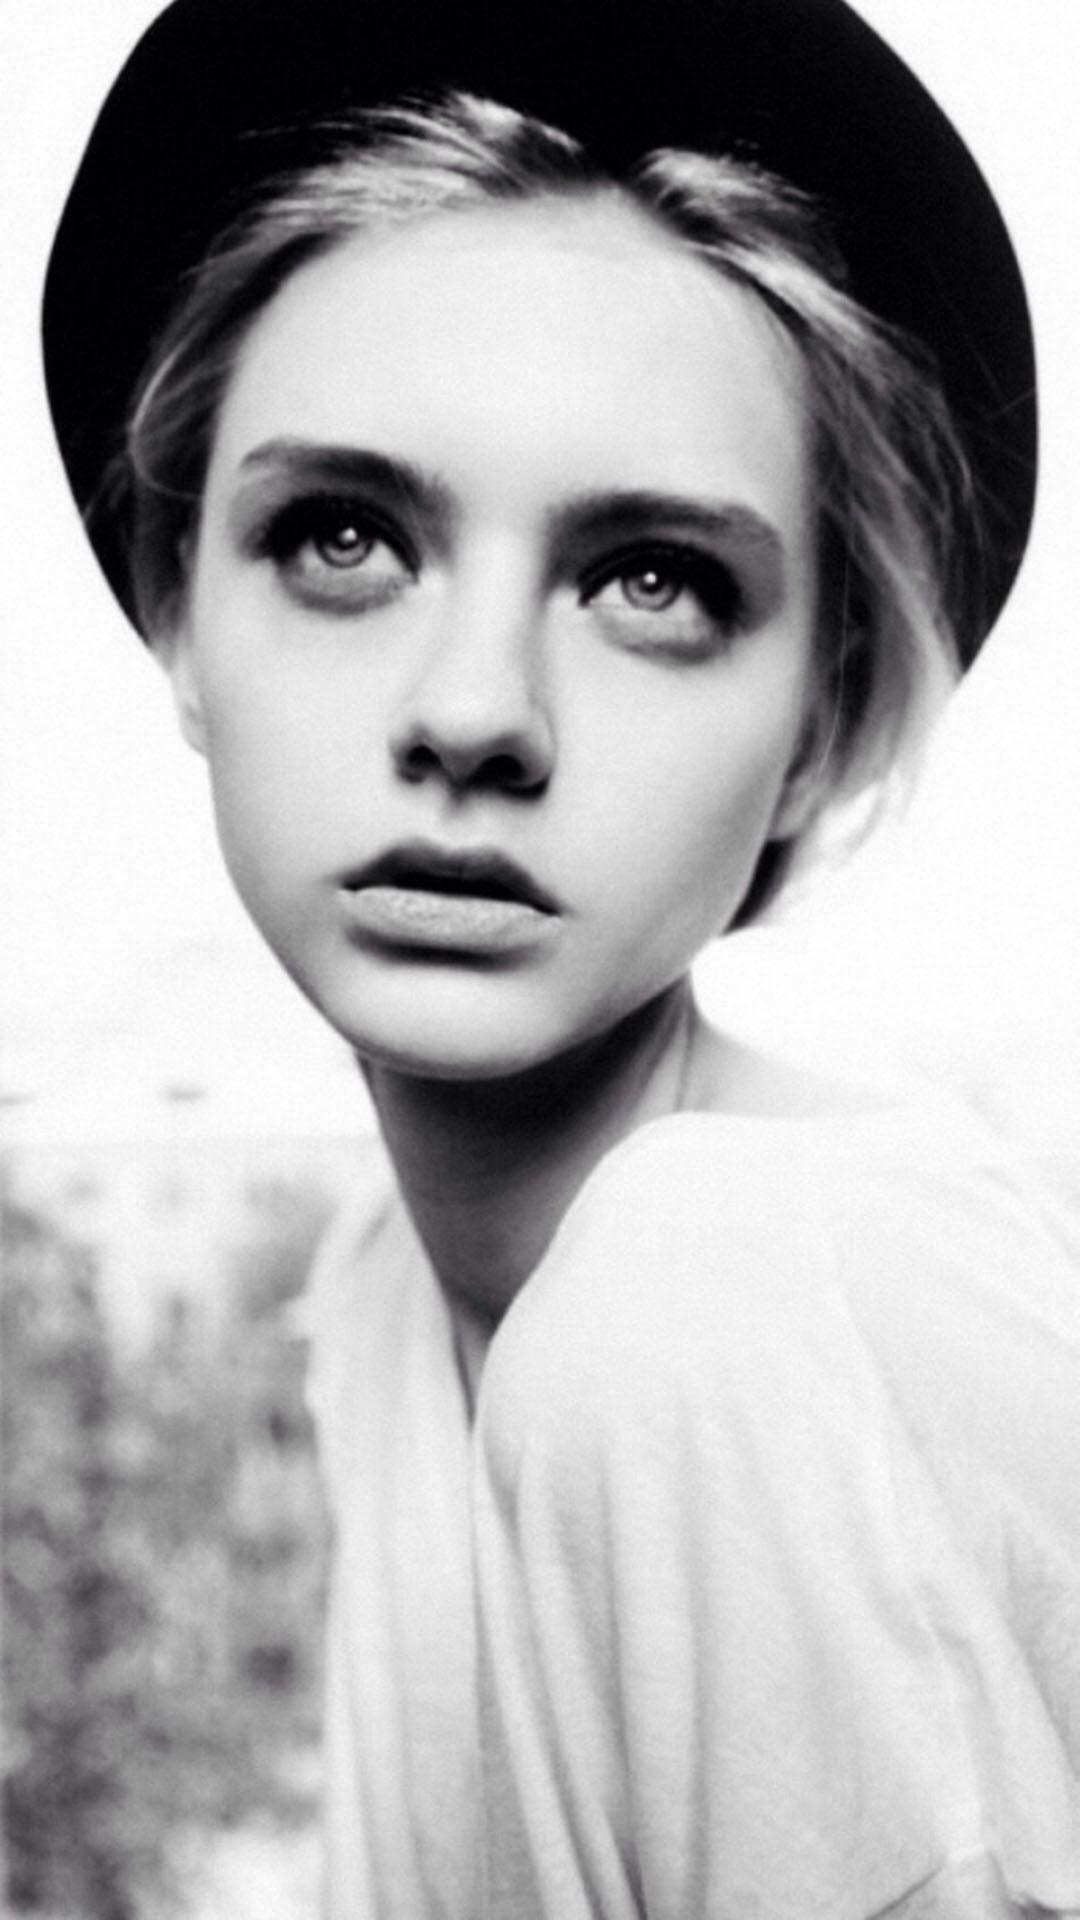 欧美 女孩黑白照